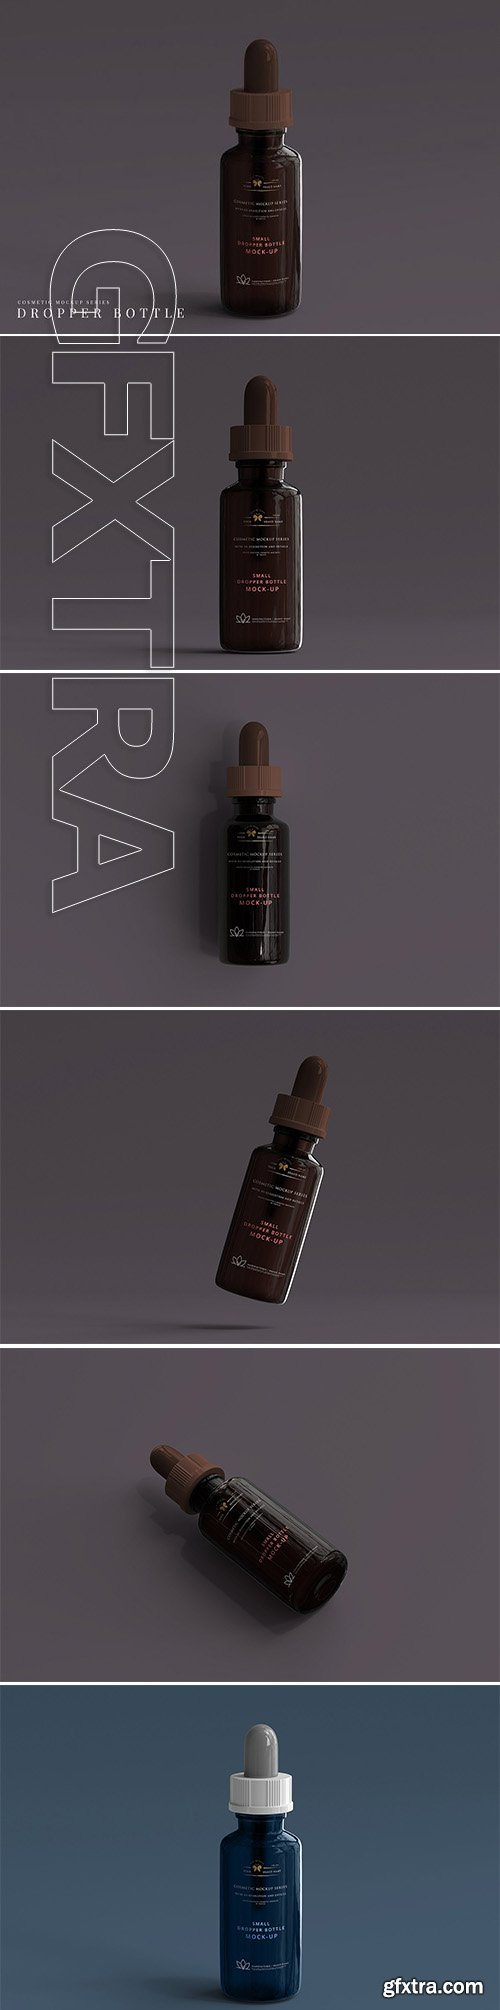 CreativeMarket - Amber Dropper Bottle Mockup 3069978